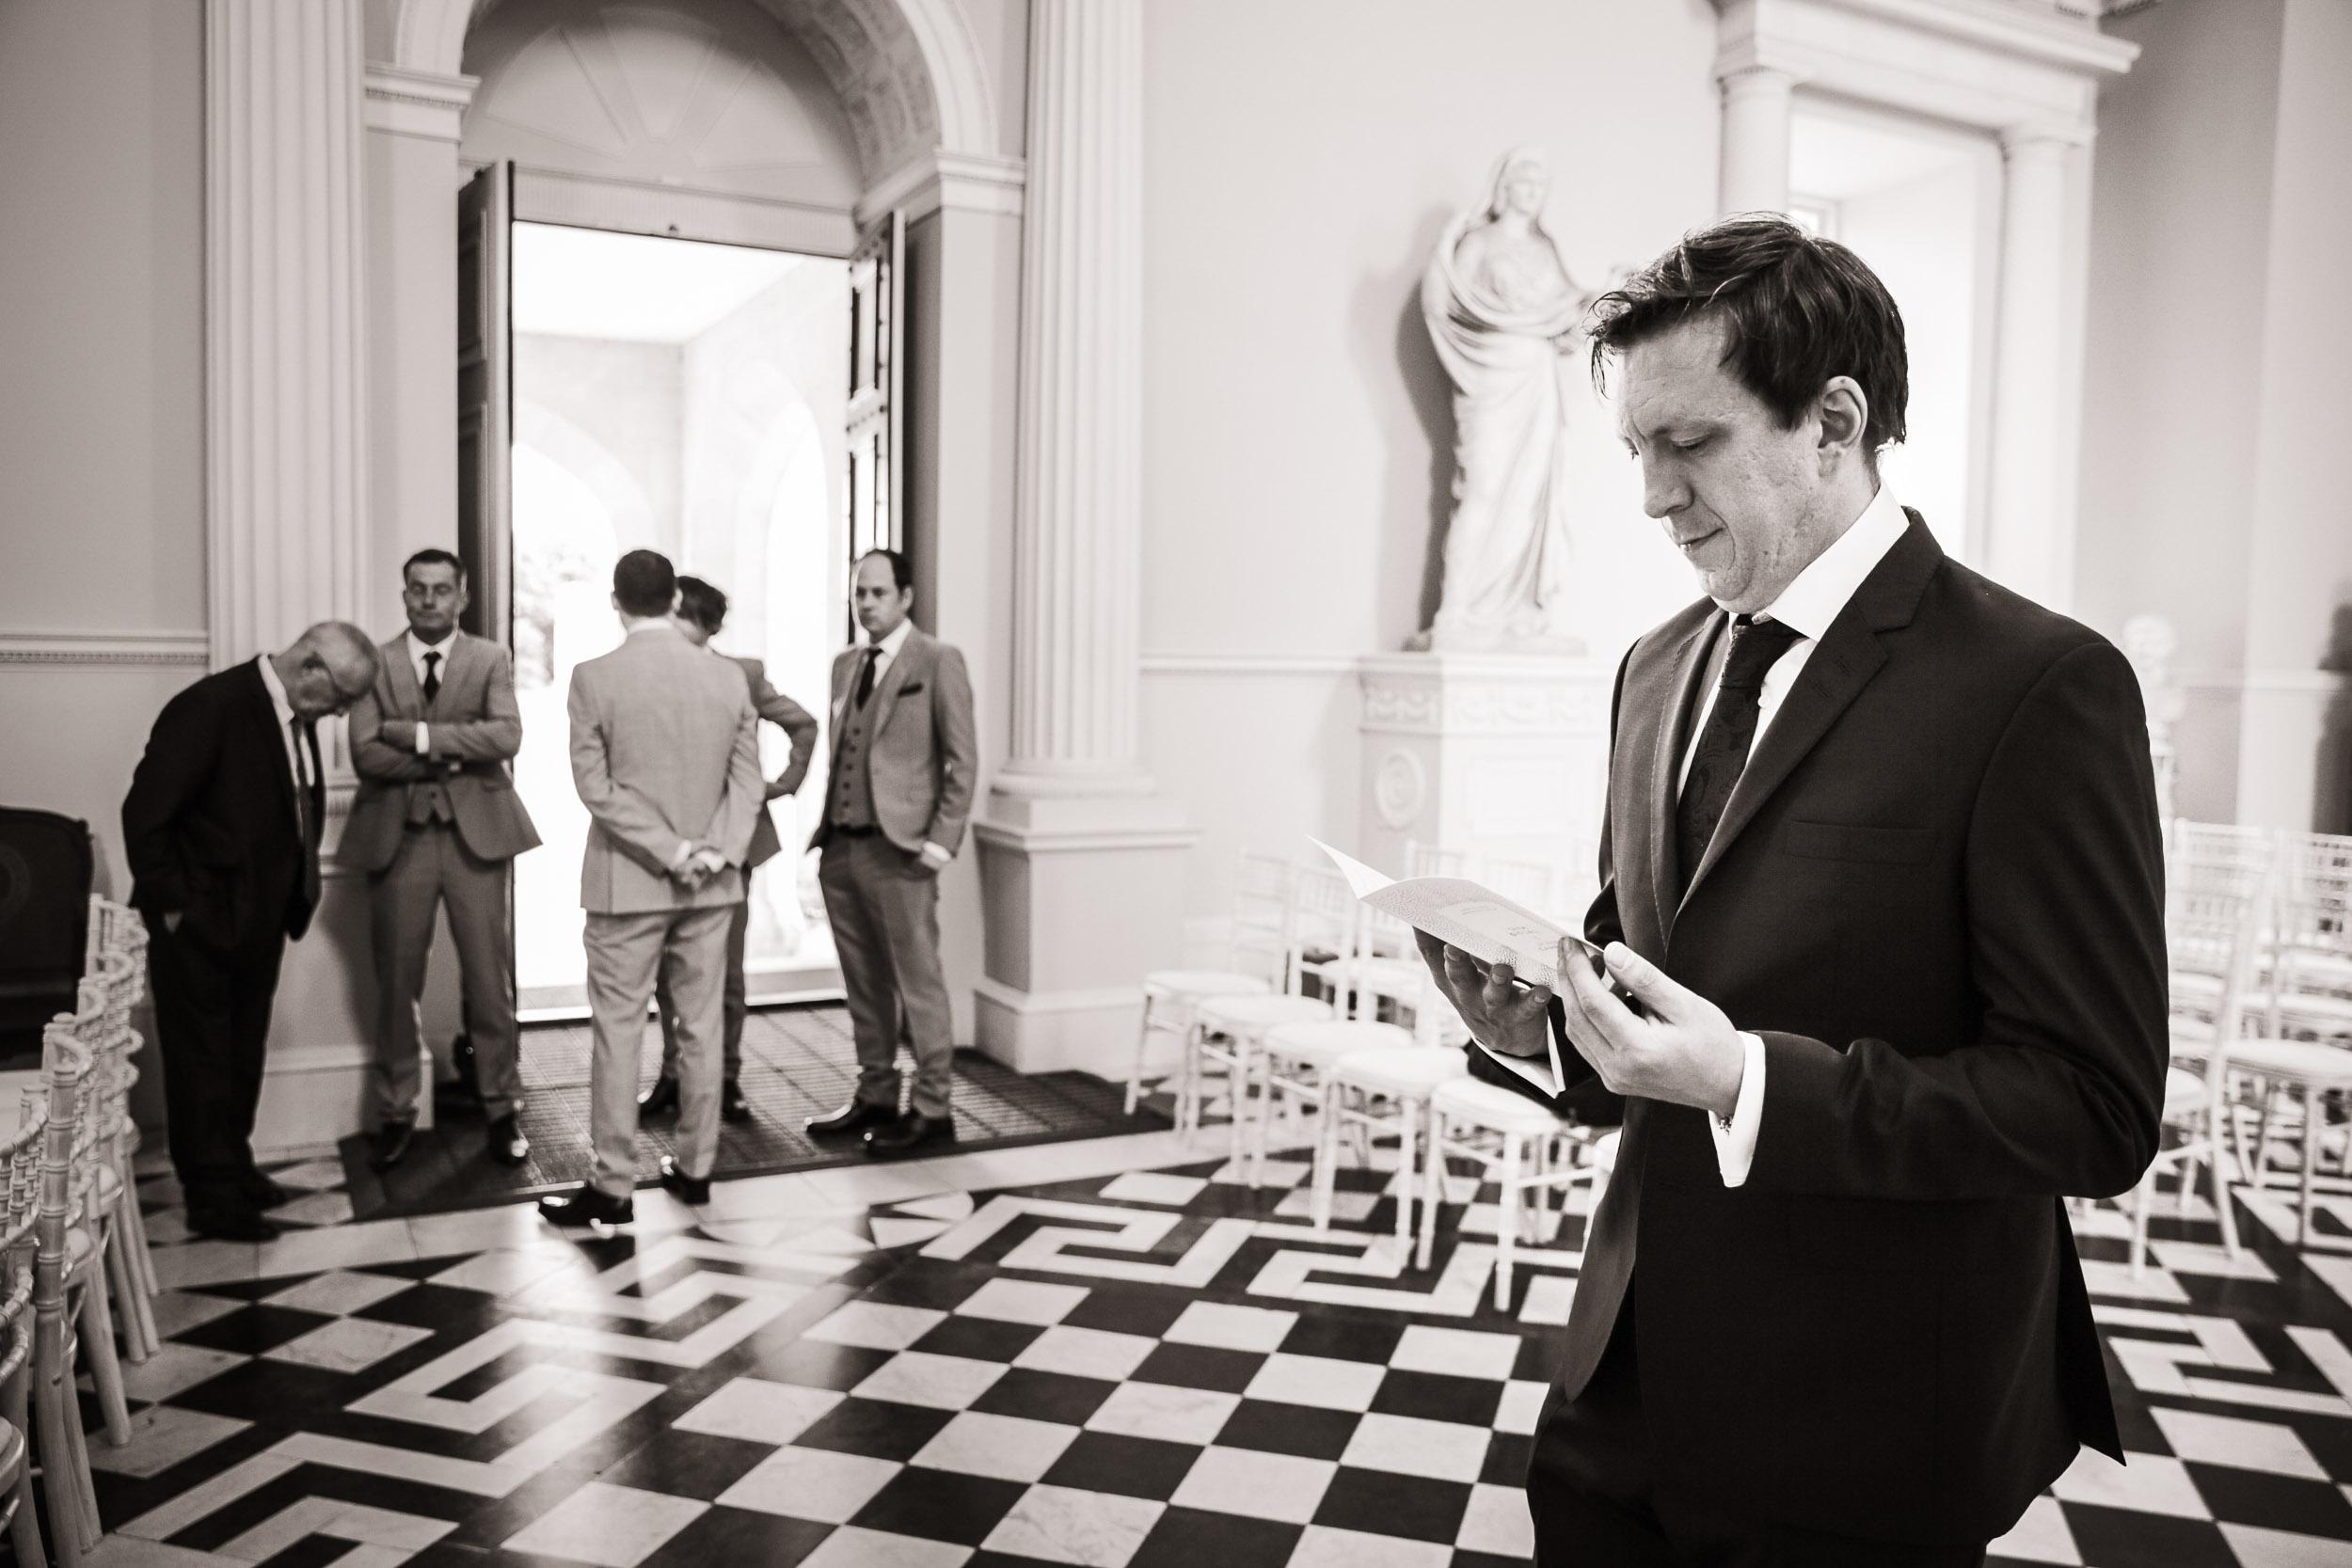 syon-house-wedding-photographer-london 022.jpg